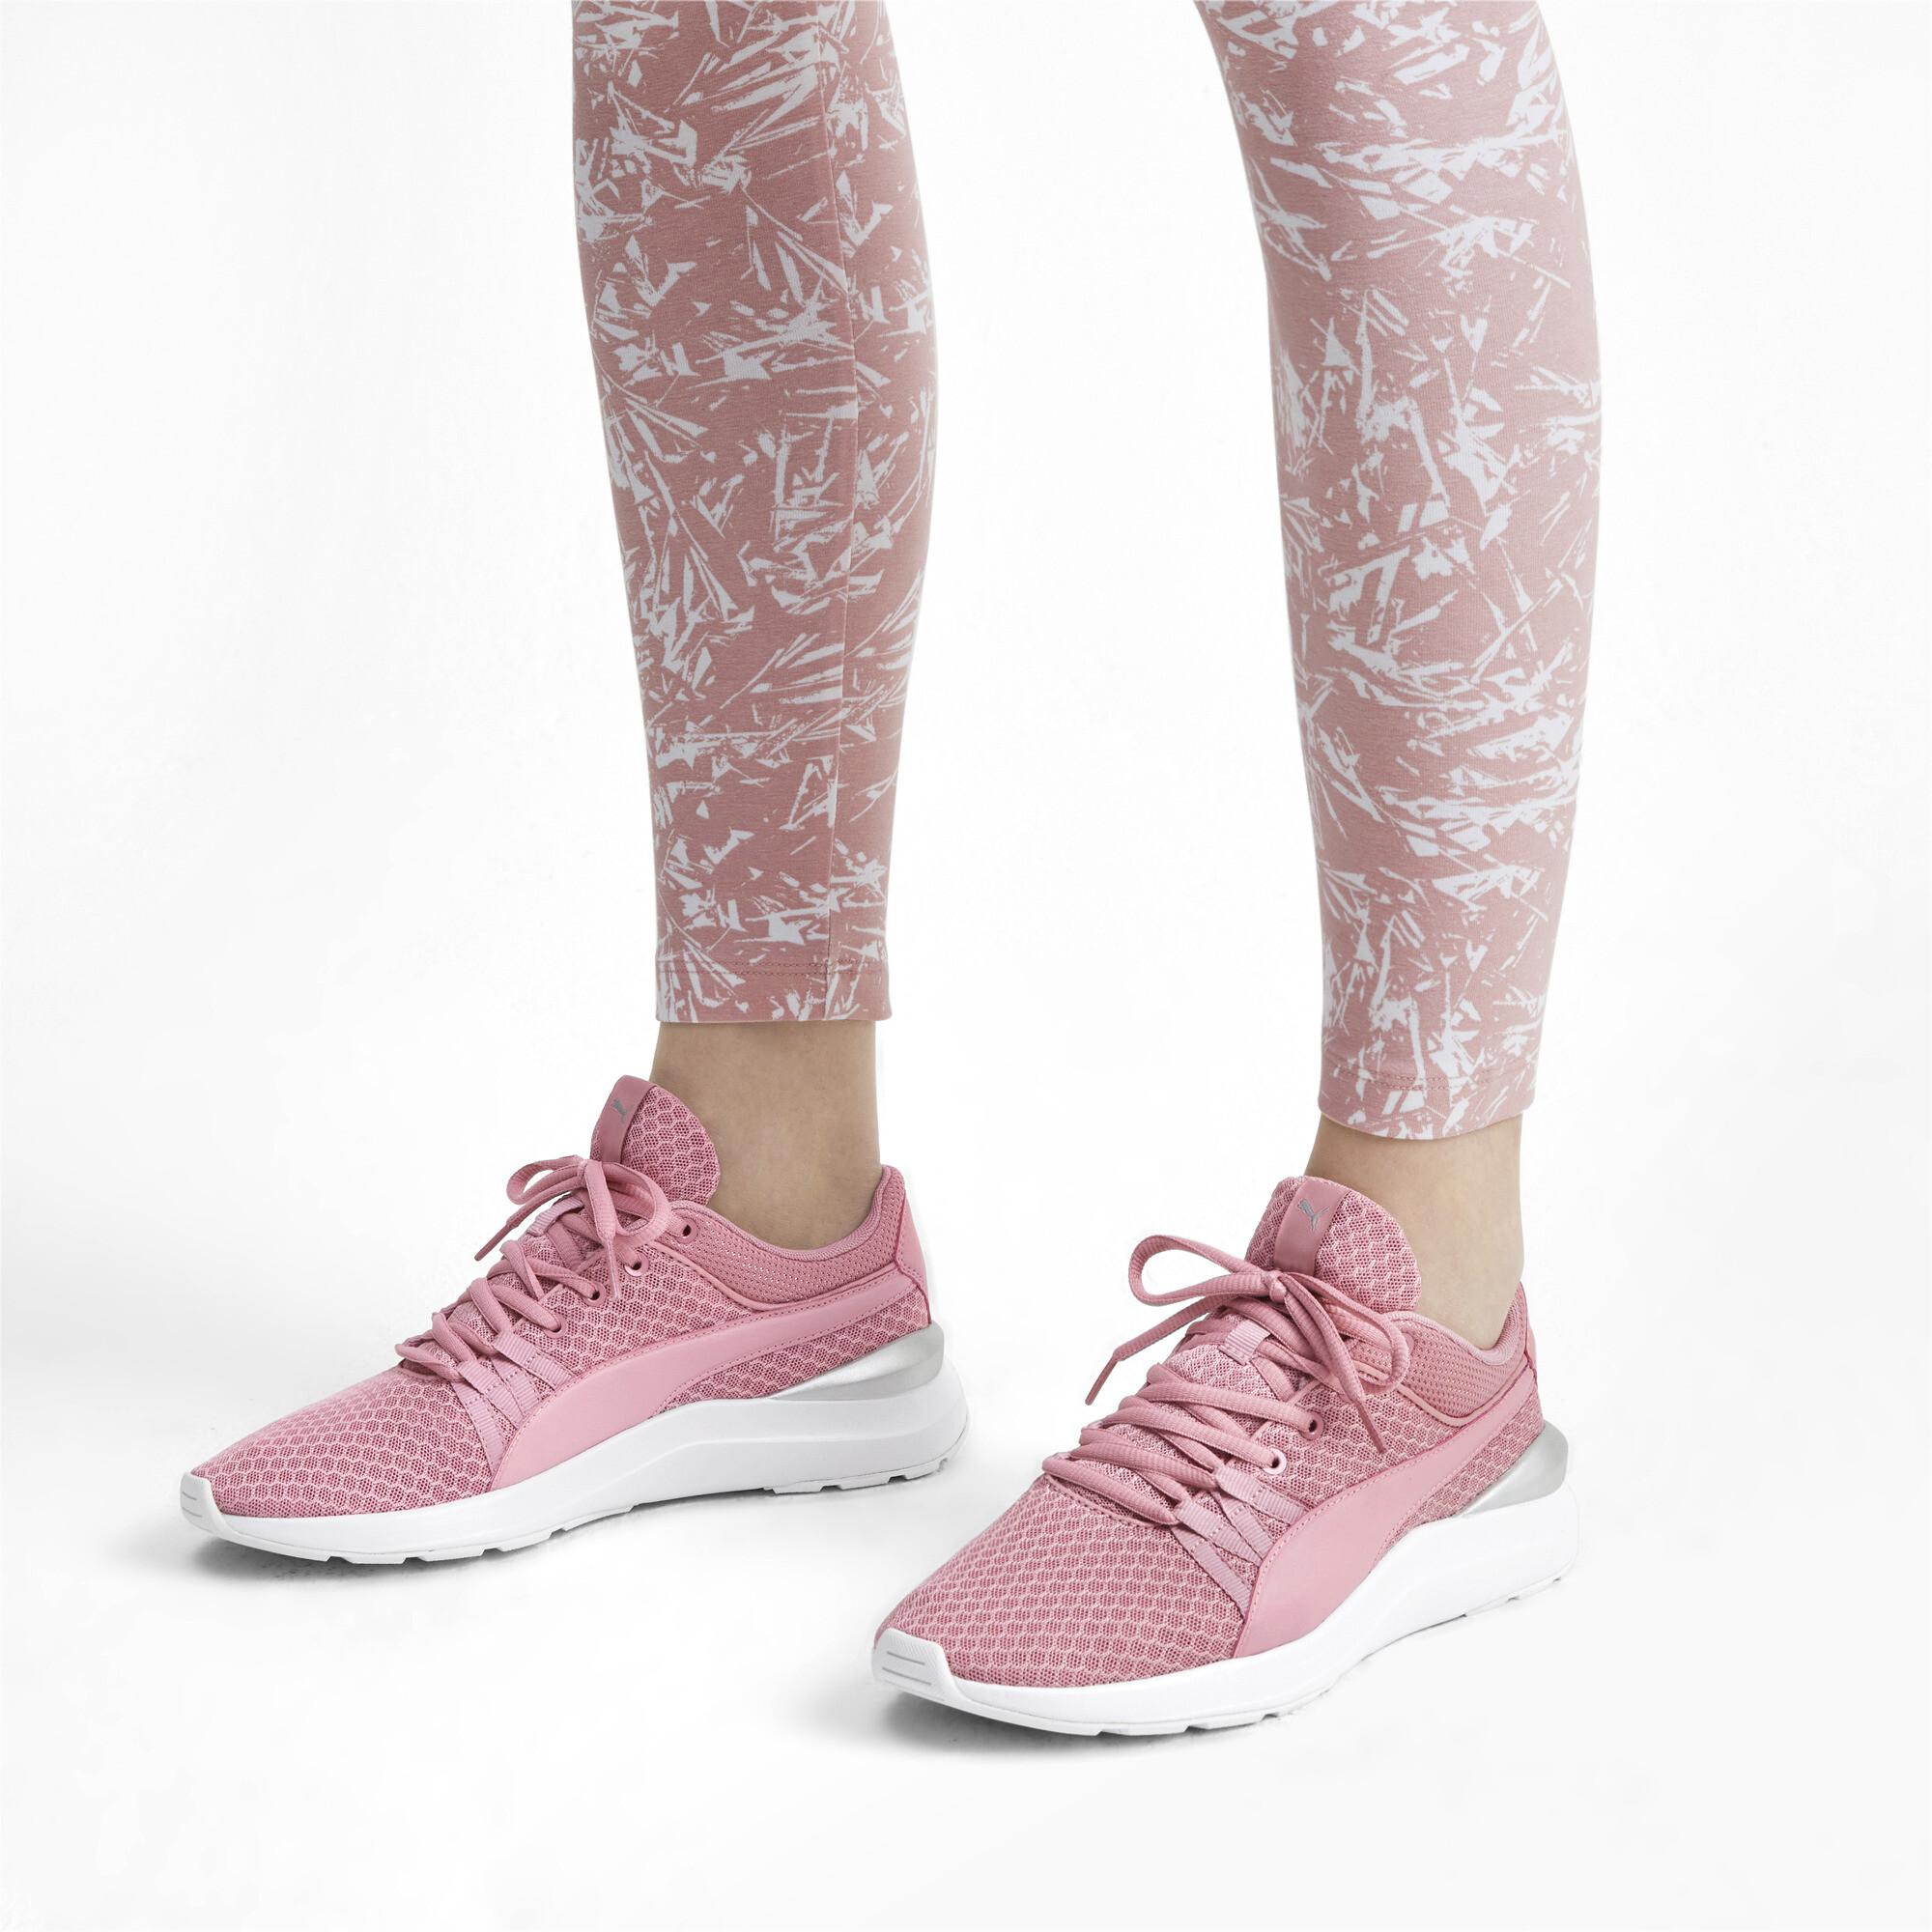 PUMA-Adela-Core-Women-s-Sneakers-Women-Shoe-Basics thumbnail 19